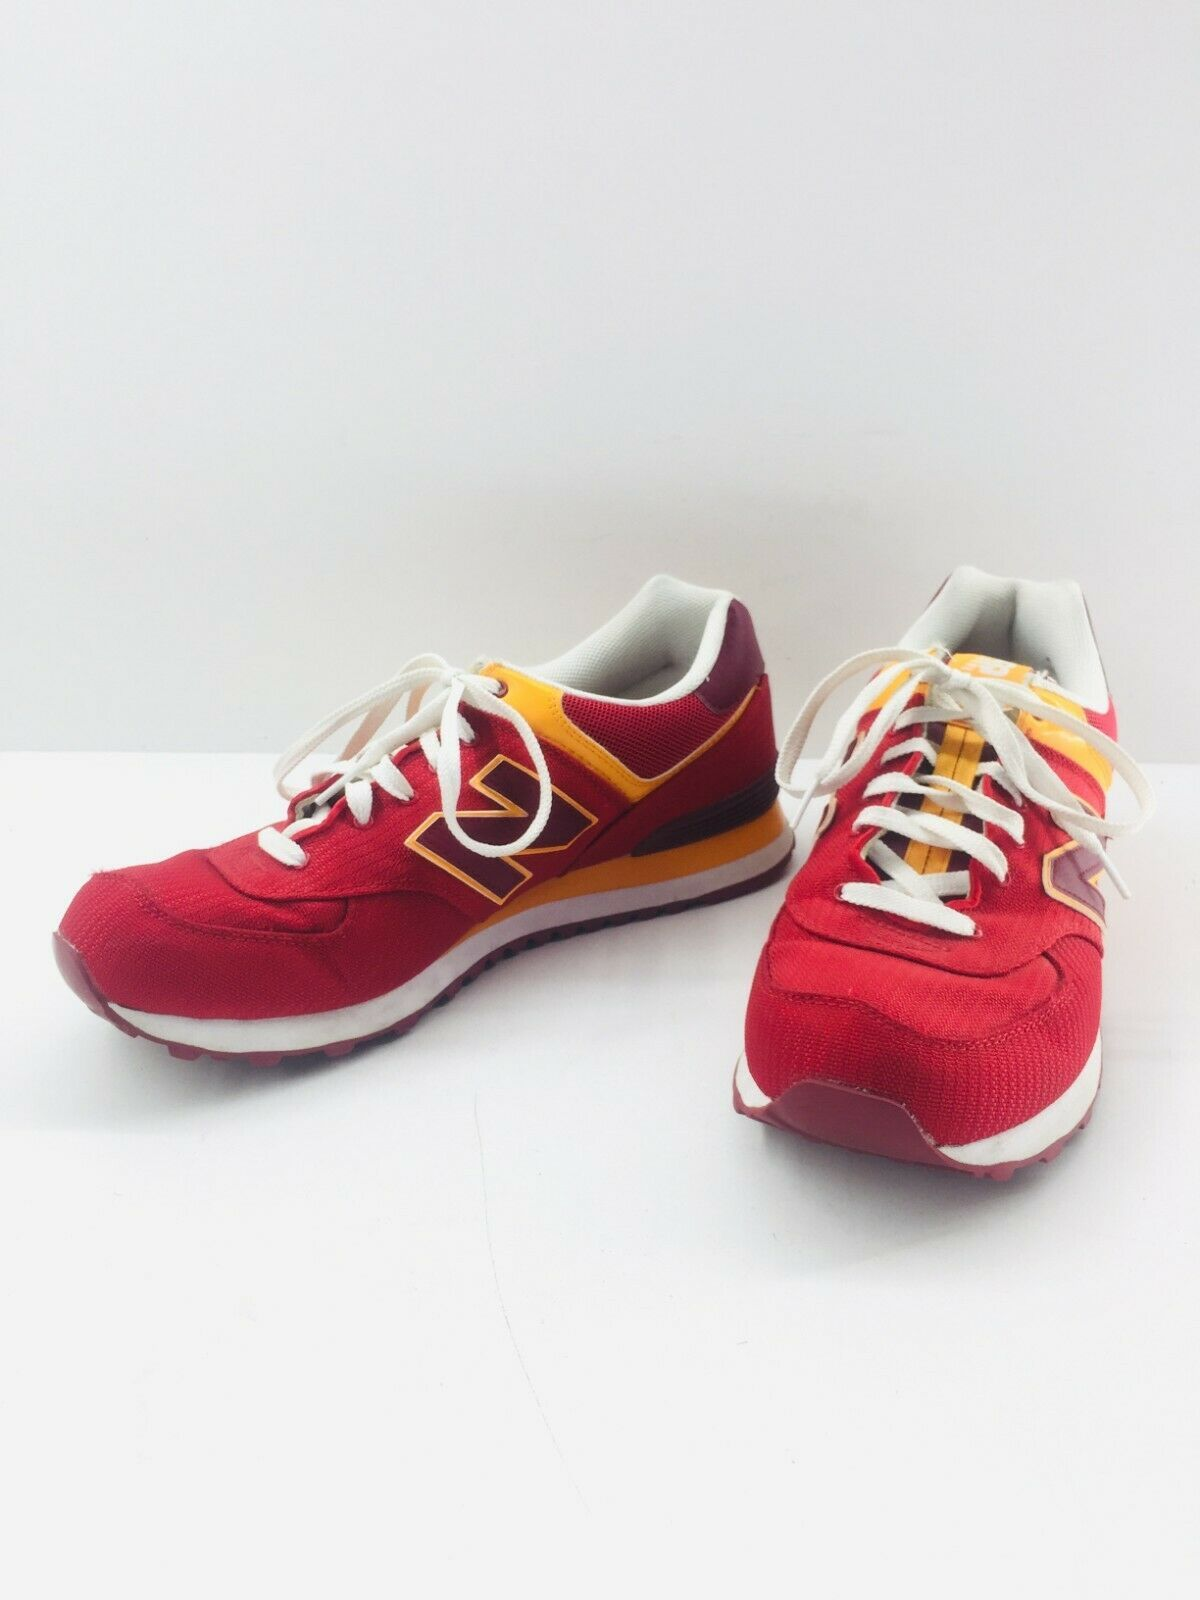 New Balance Athletic Sneaker Shoes Men's Sz 11.5 Red Orange ML574PPR  574 EUC image 4